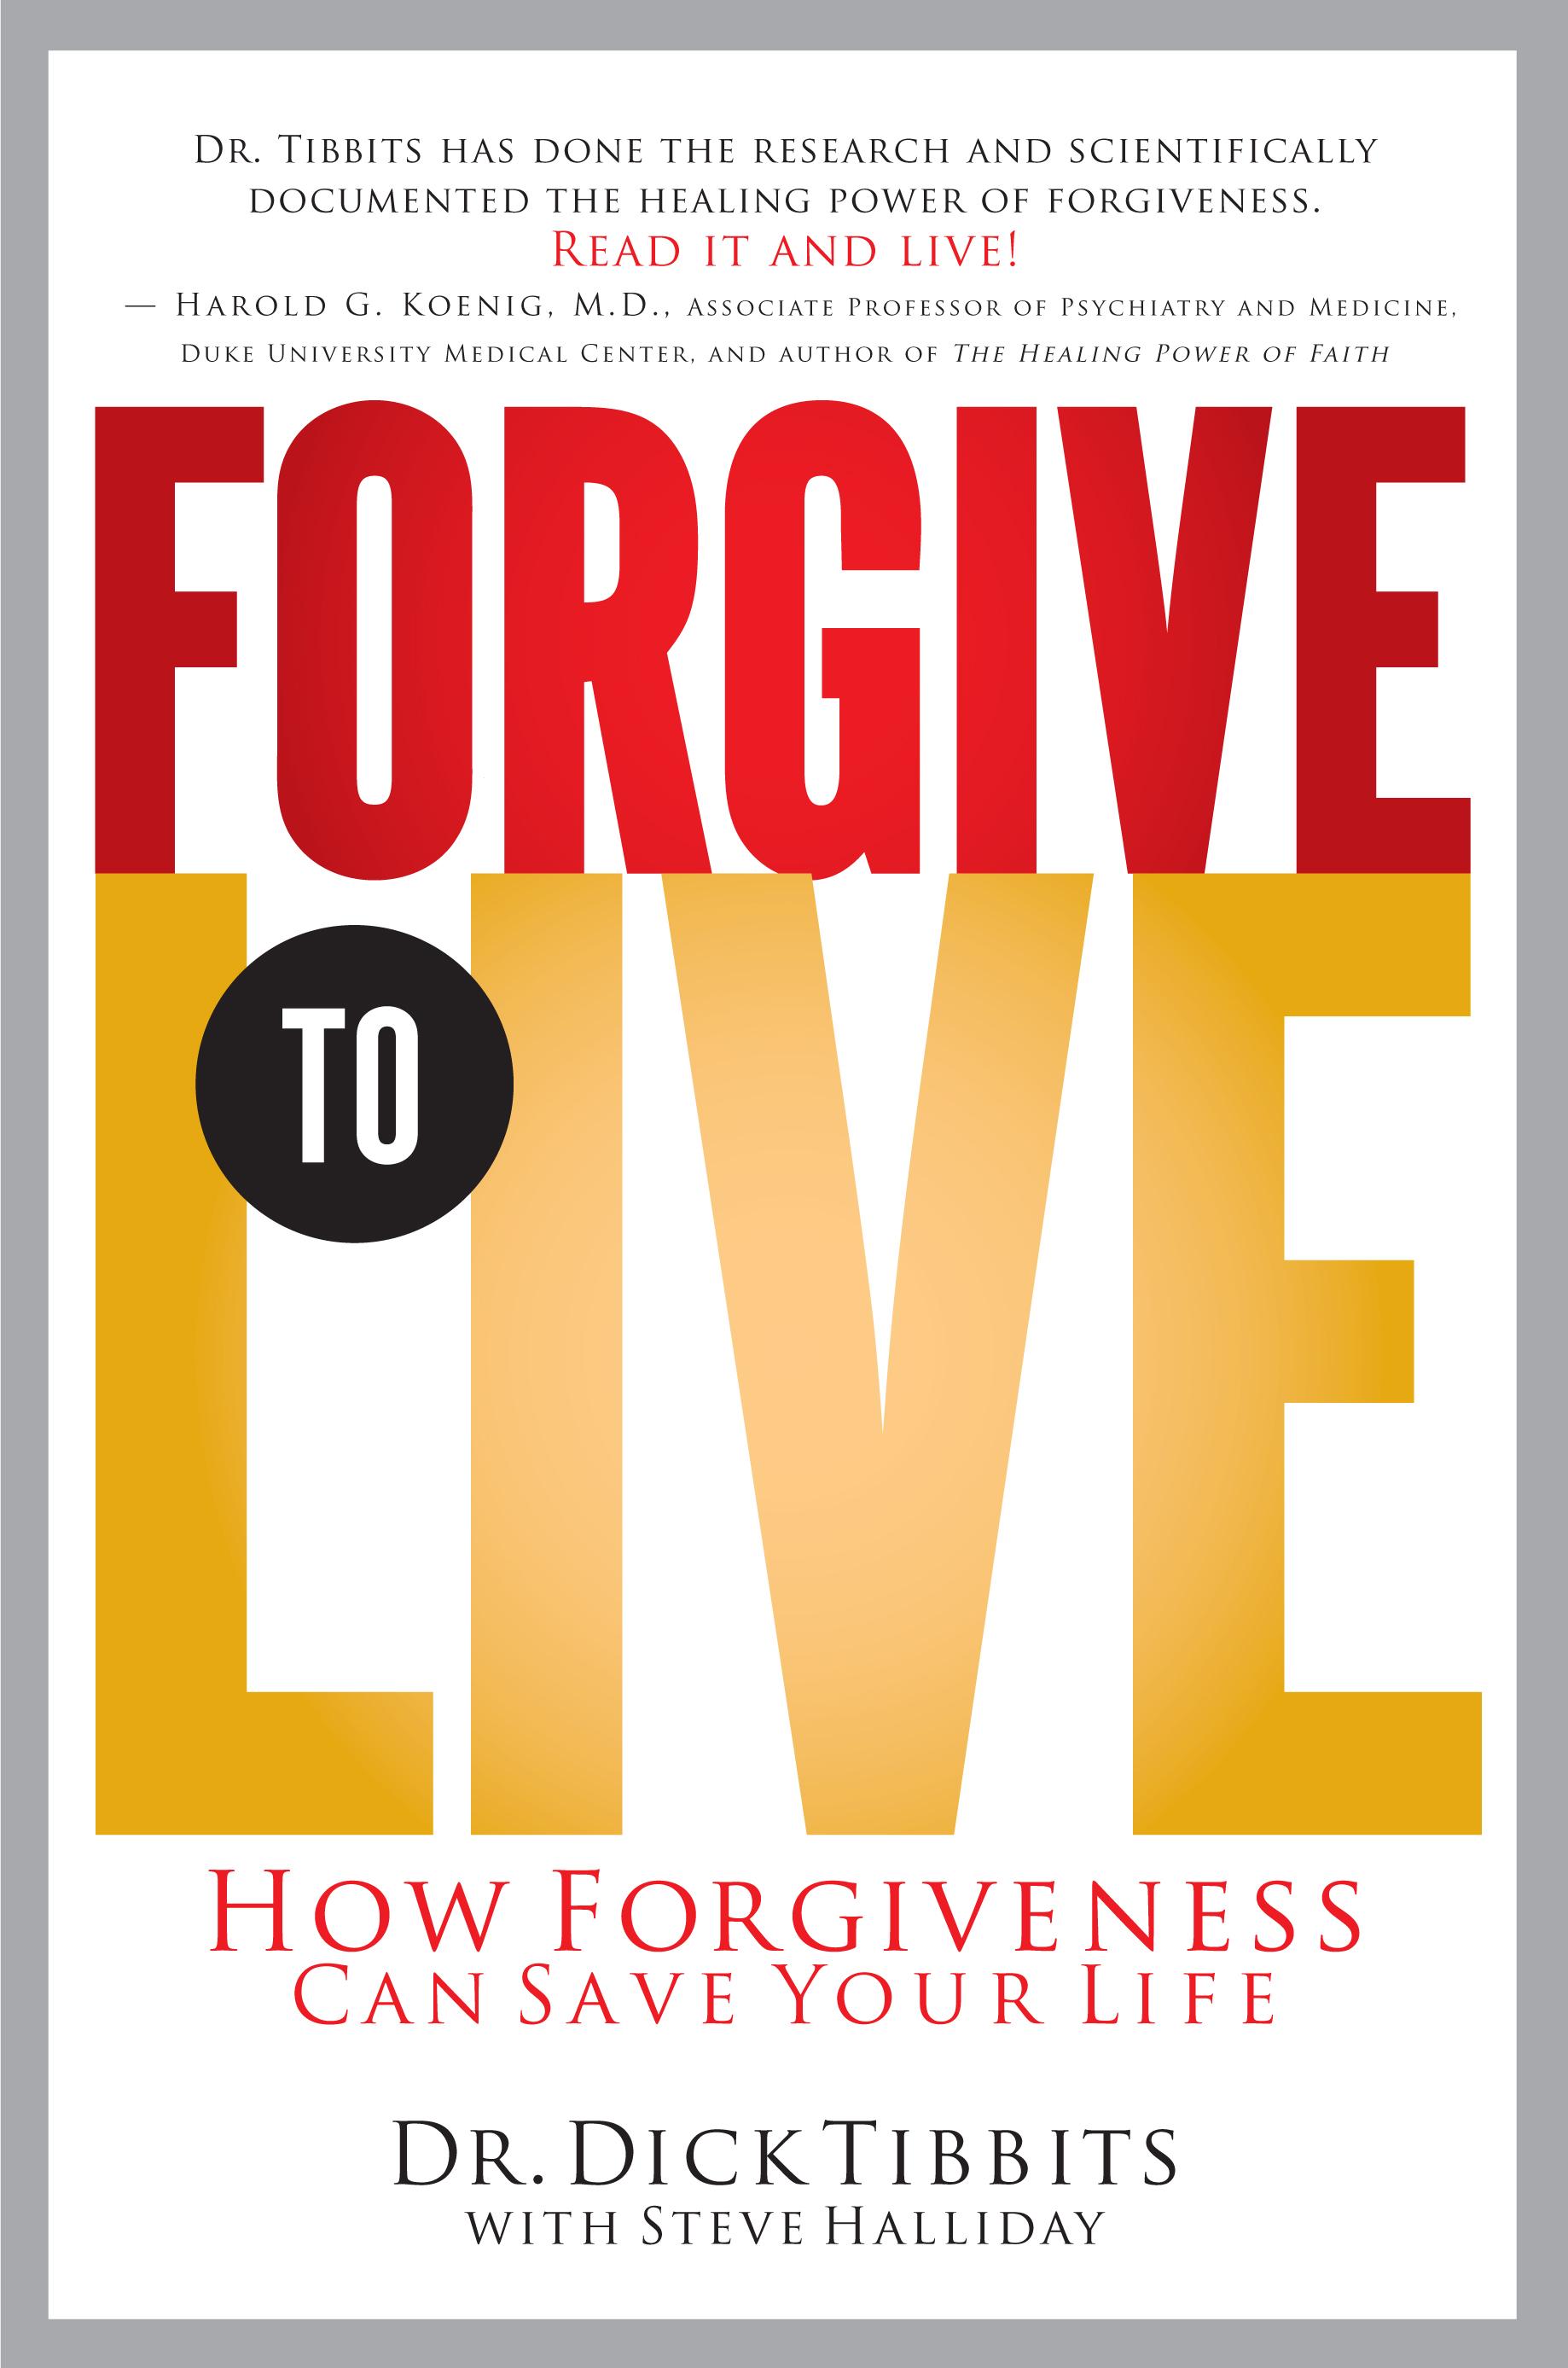 DICK TIBBITS FORGIVE TO LIVE (1)